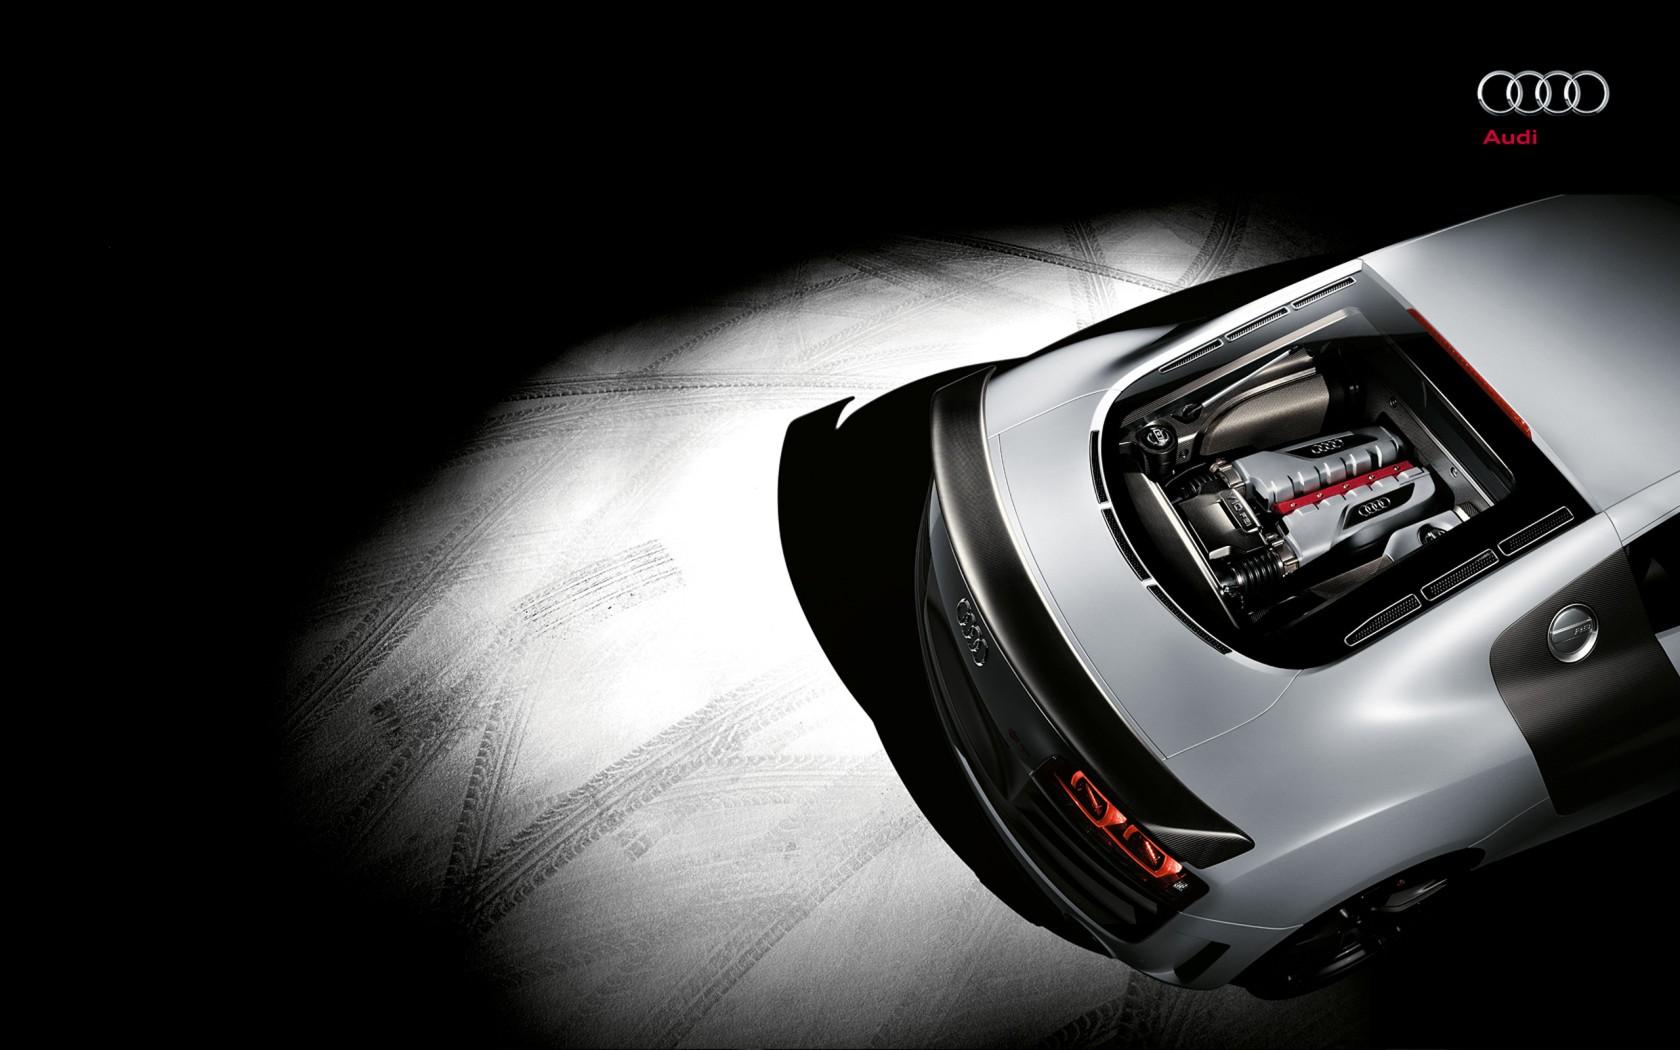 Iphone Wallpaper Muscle Car Audi R8 Rear Engine Wallpaper Hd Car Wallpapers Id 2474